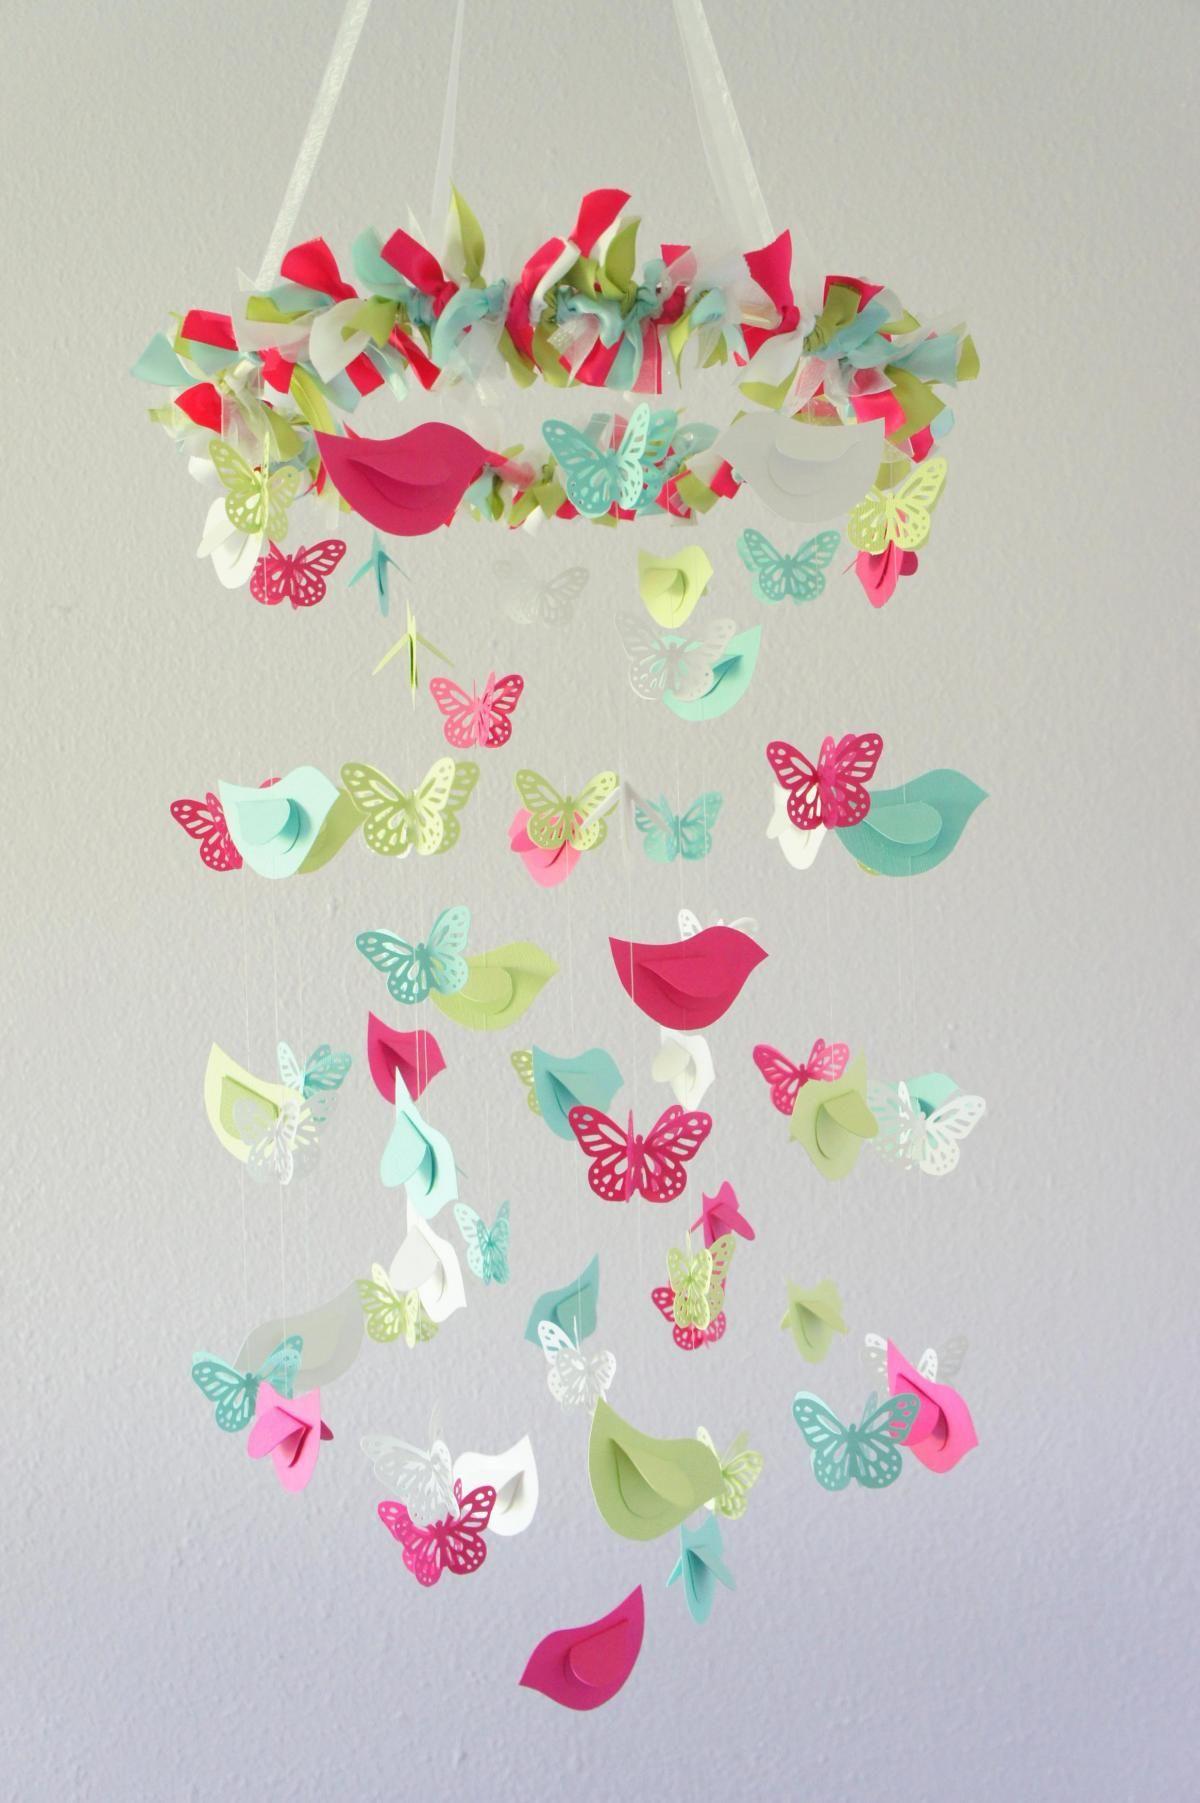 Butterflies Birds Nursery Mobile In Bright Pink Aqua Yellow Moviles Para Niños Manualidades Móviles Para Bebés